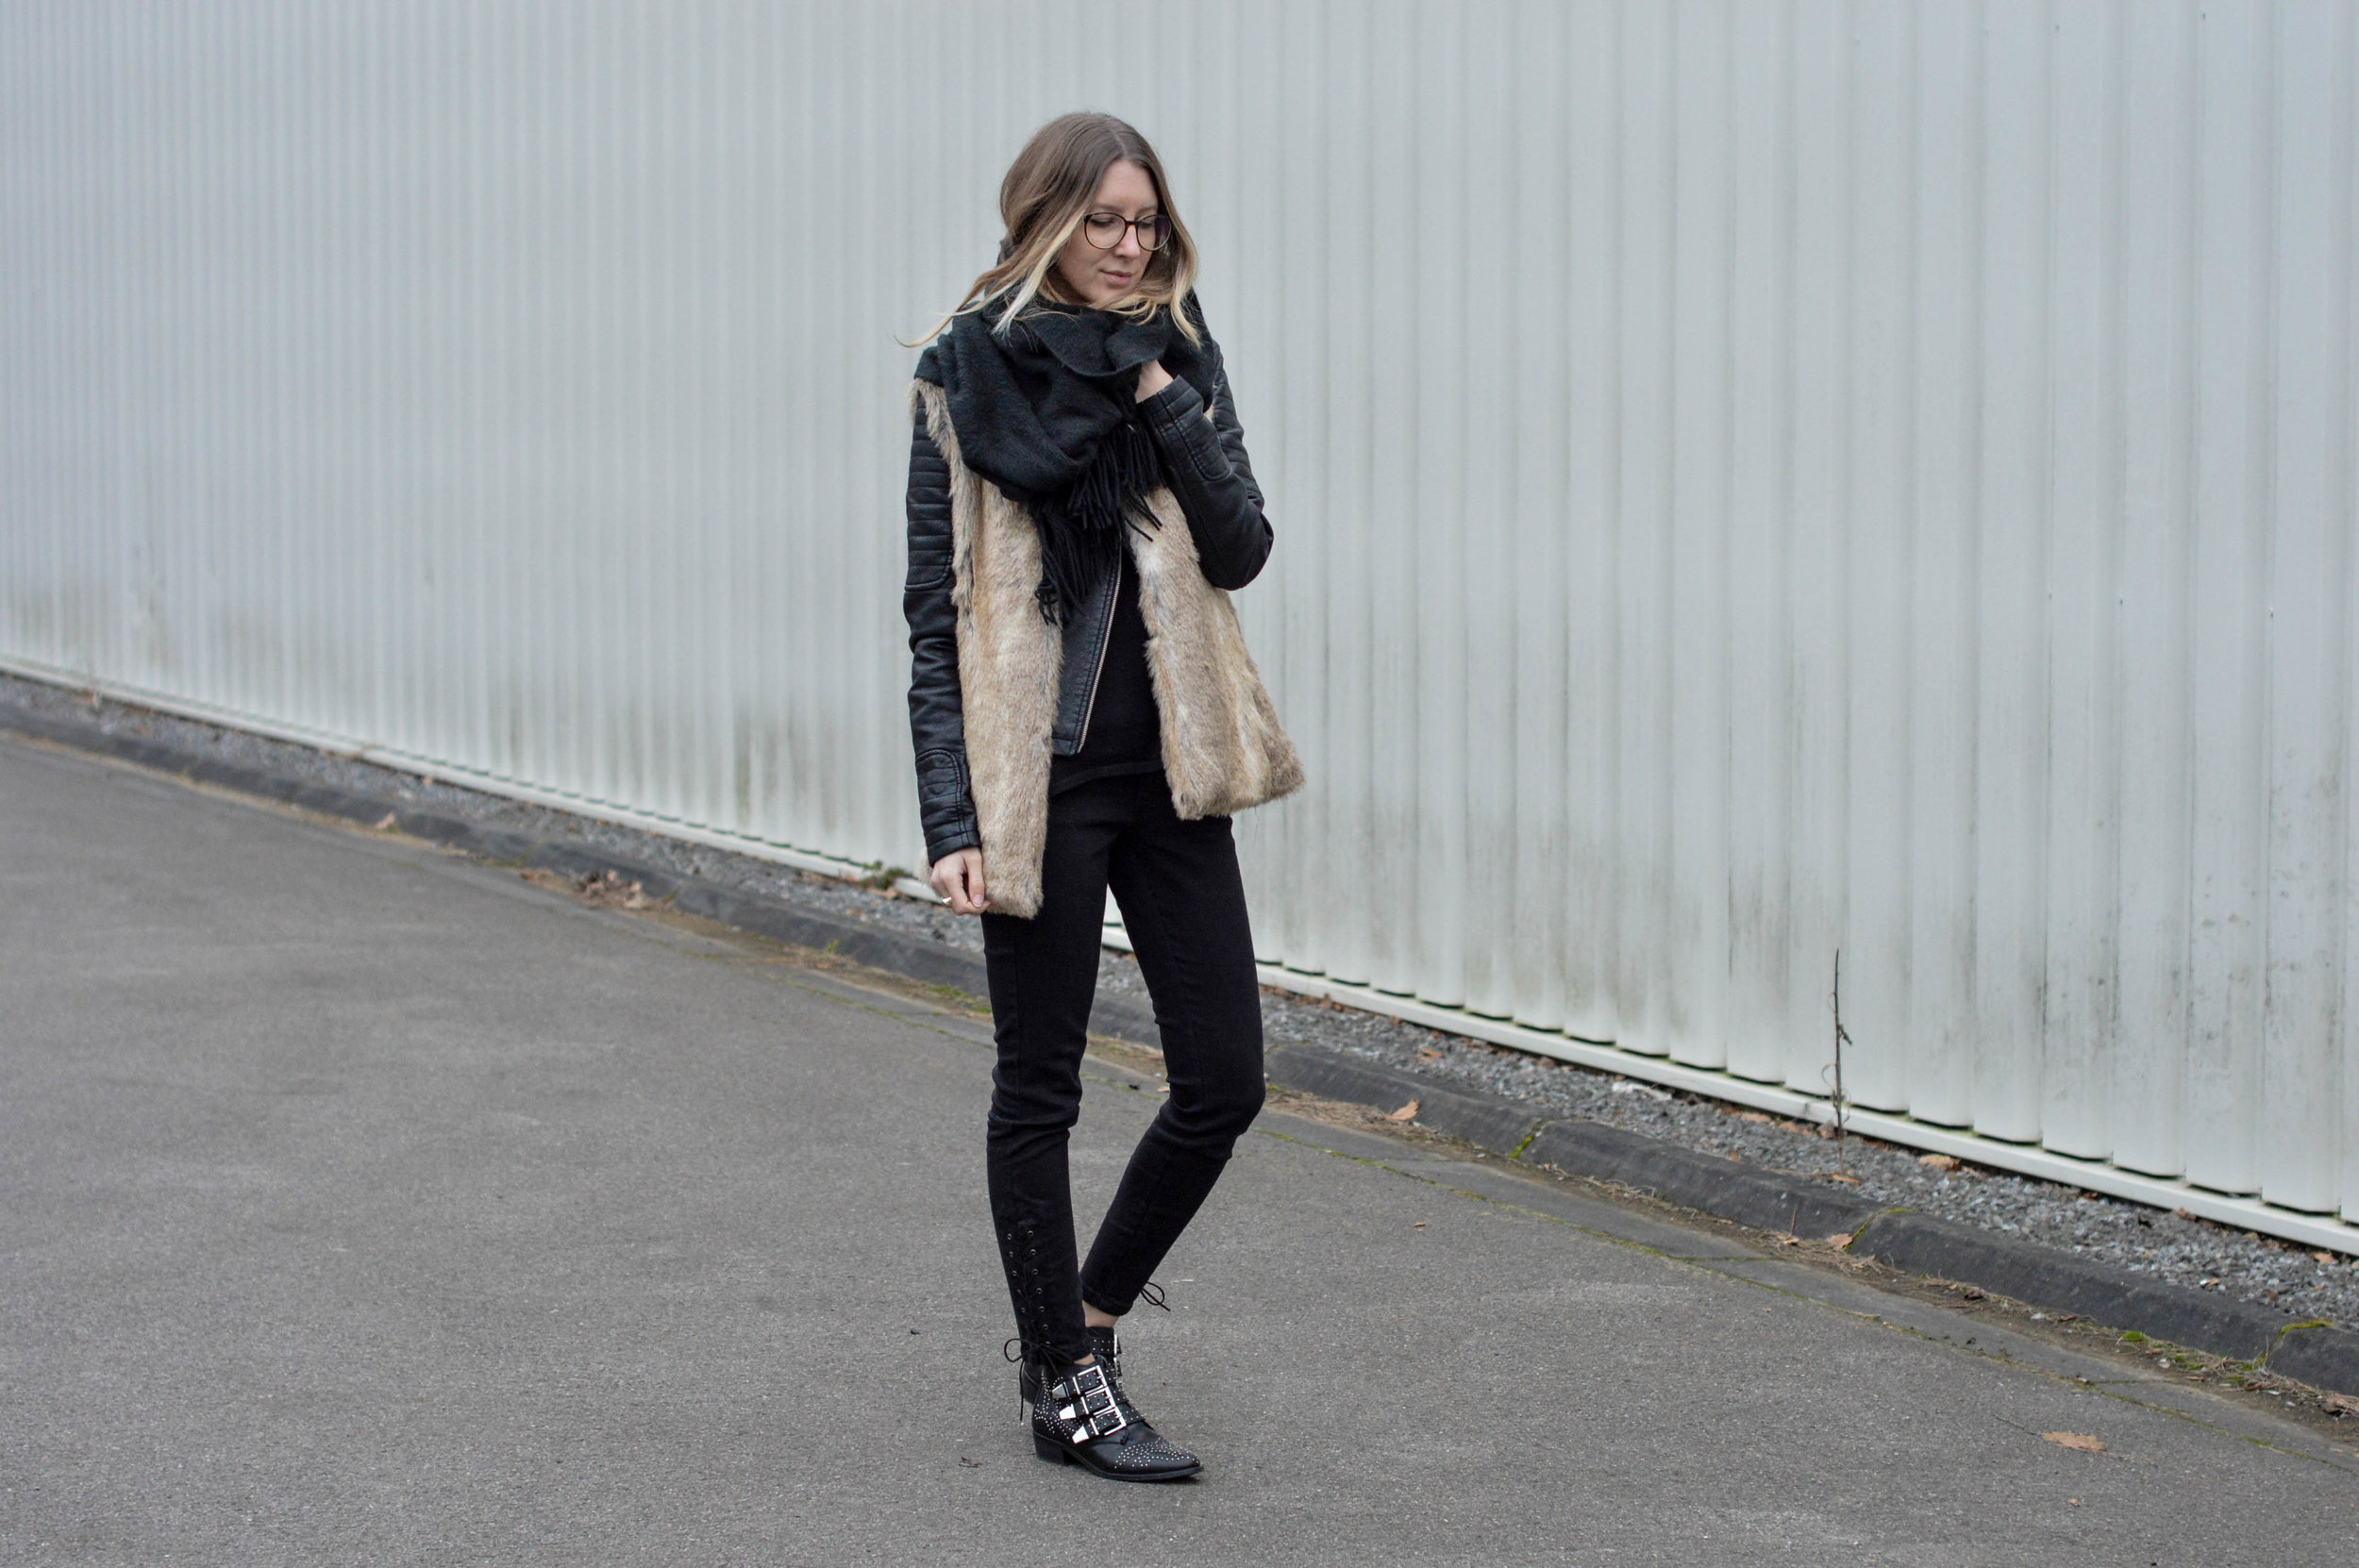 Faux Fur Jacket - OSIARAH.COM (12 of 17).jpg